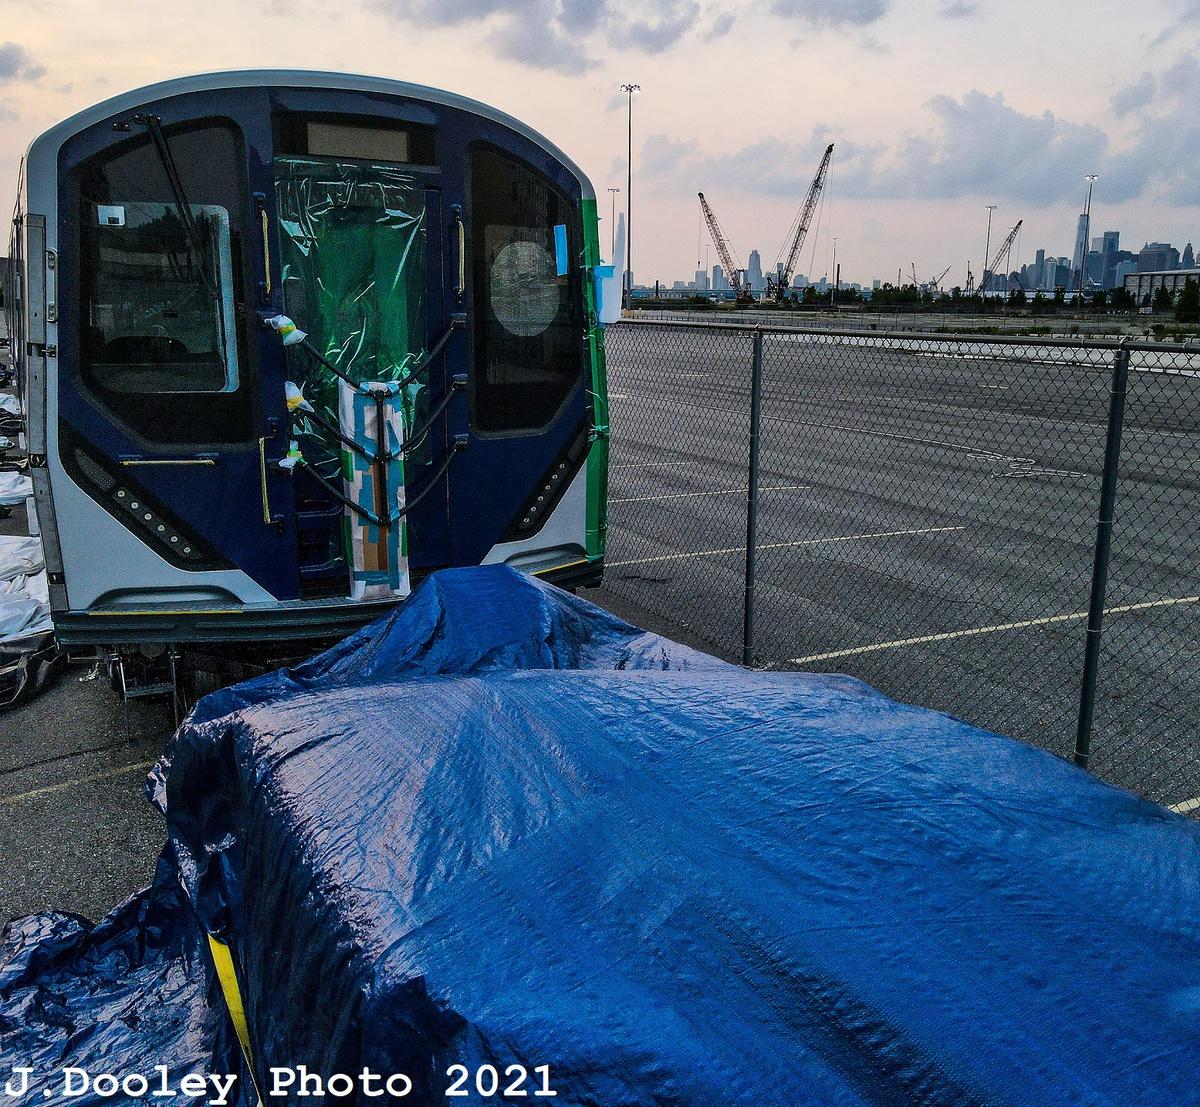 (786k, 1200x1107)<br><b>Country:</b> United States<br><b>City:</b> New York<br><b>System:</b> New York City Transit<br><b>Route:</b> Delivery<br><b>Car:</b> R-211 (Kawasaki, 2021-) 4065 <br><b>Photo by:</b> John Dooley<br><b>Date:</b> 7/15/2021<br><b>Notes:</b> Delivery at SBK yard<br><b>Viewed (this week/total):</b> 5 / 134